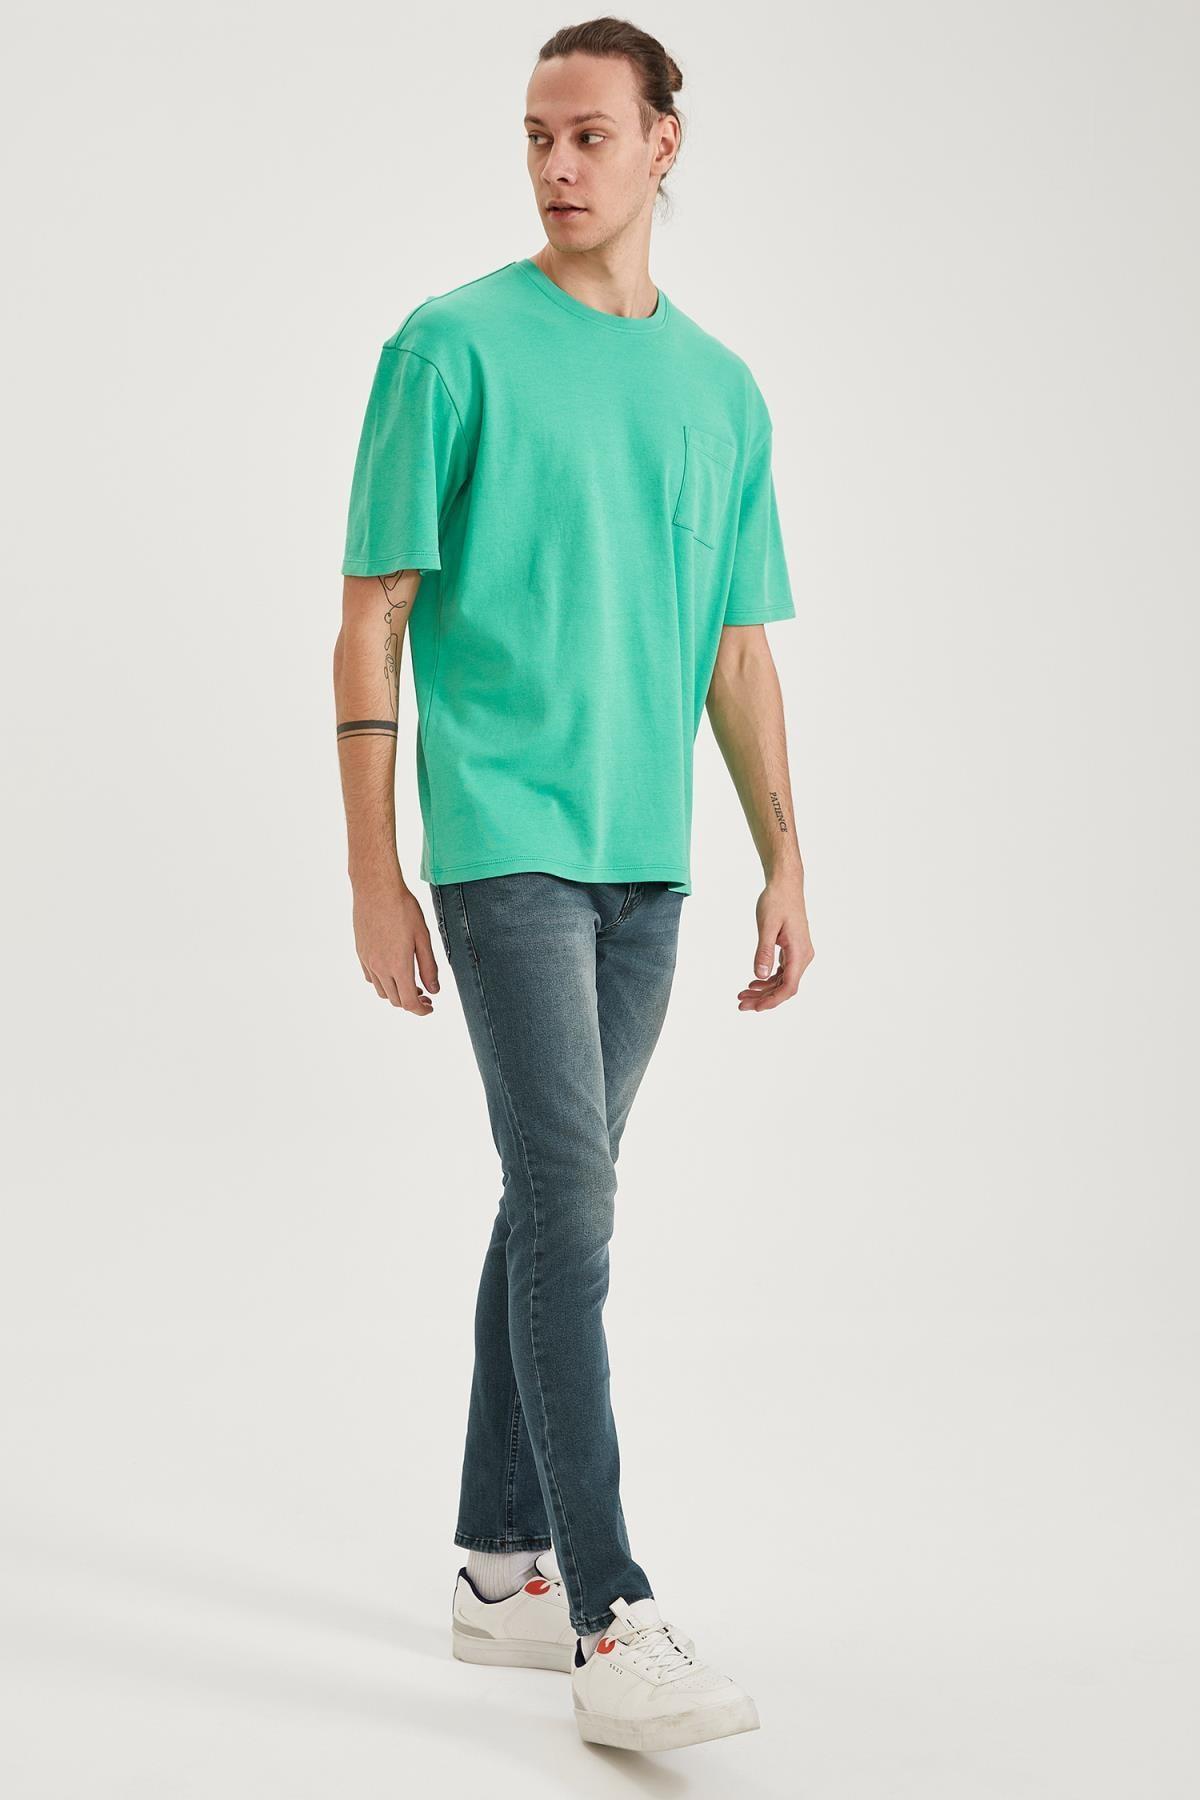 Defacto Oversize Fit Bisiklet Yaka Basic Tişört 1